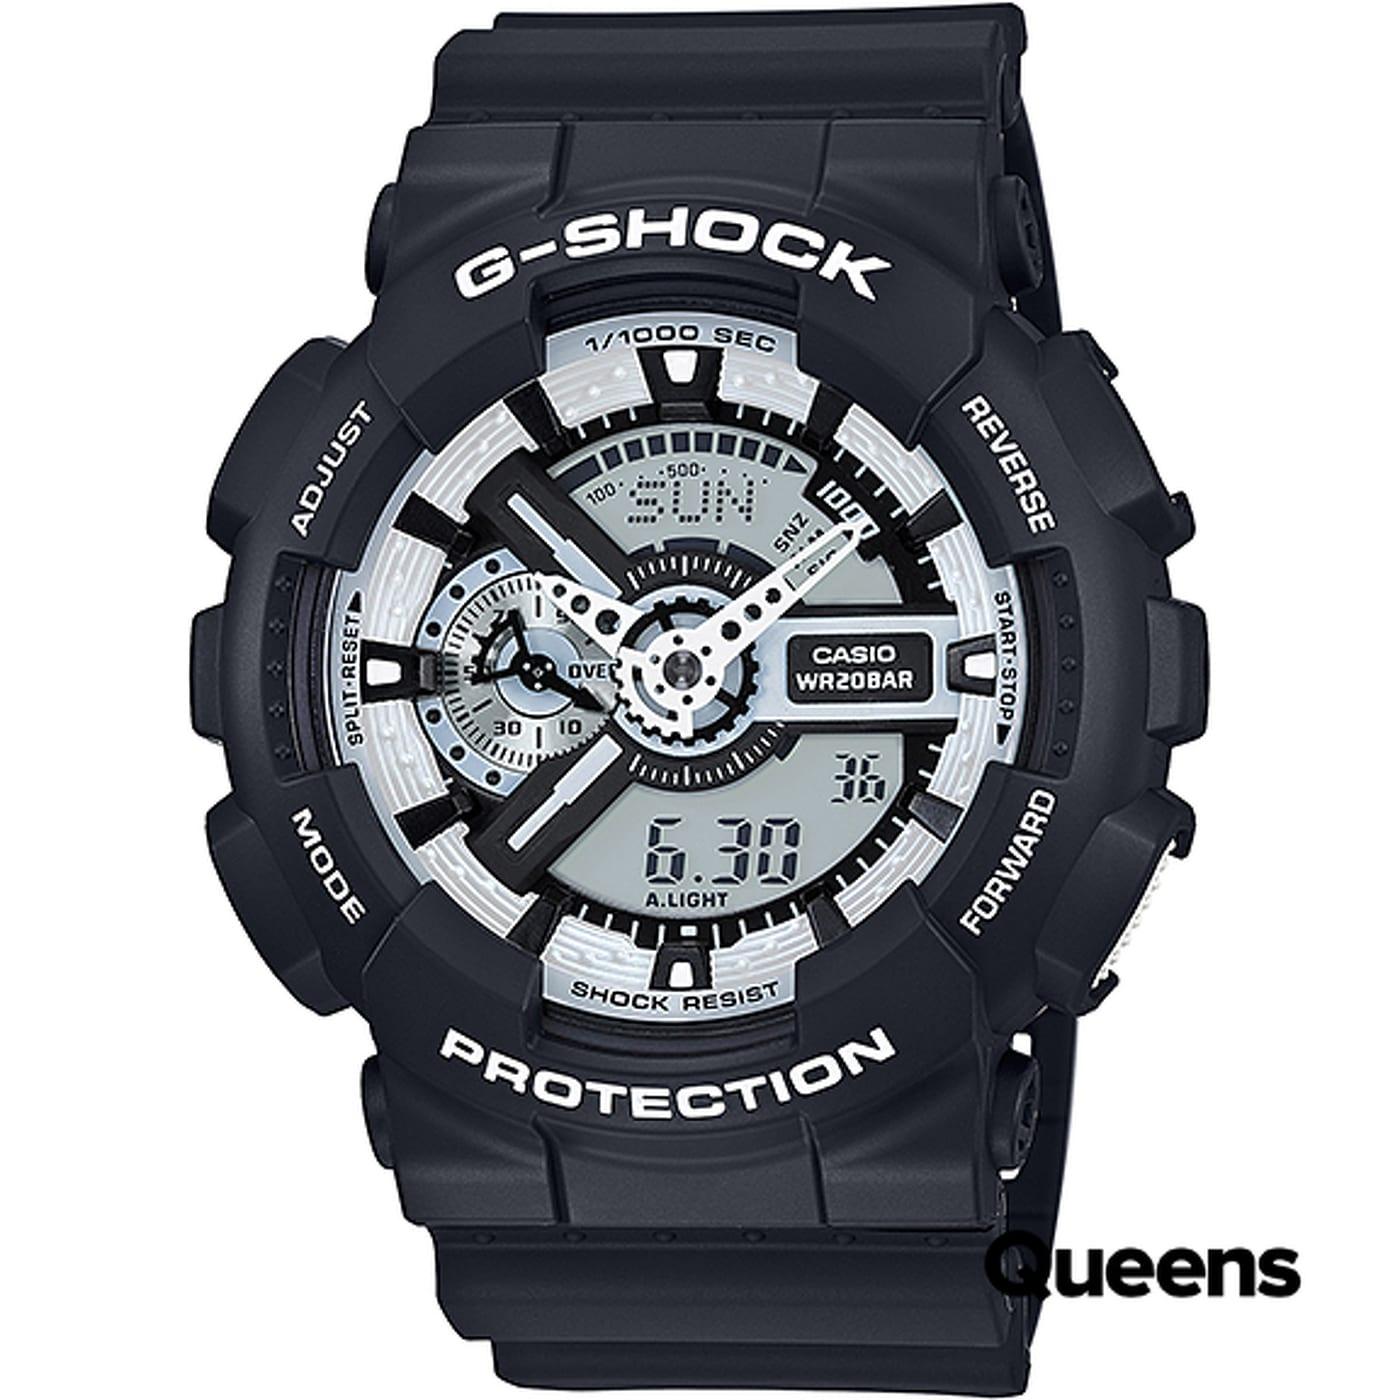 Casio G-Shock GA 110BW-1AER black